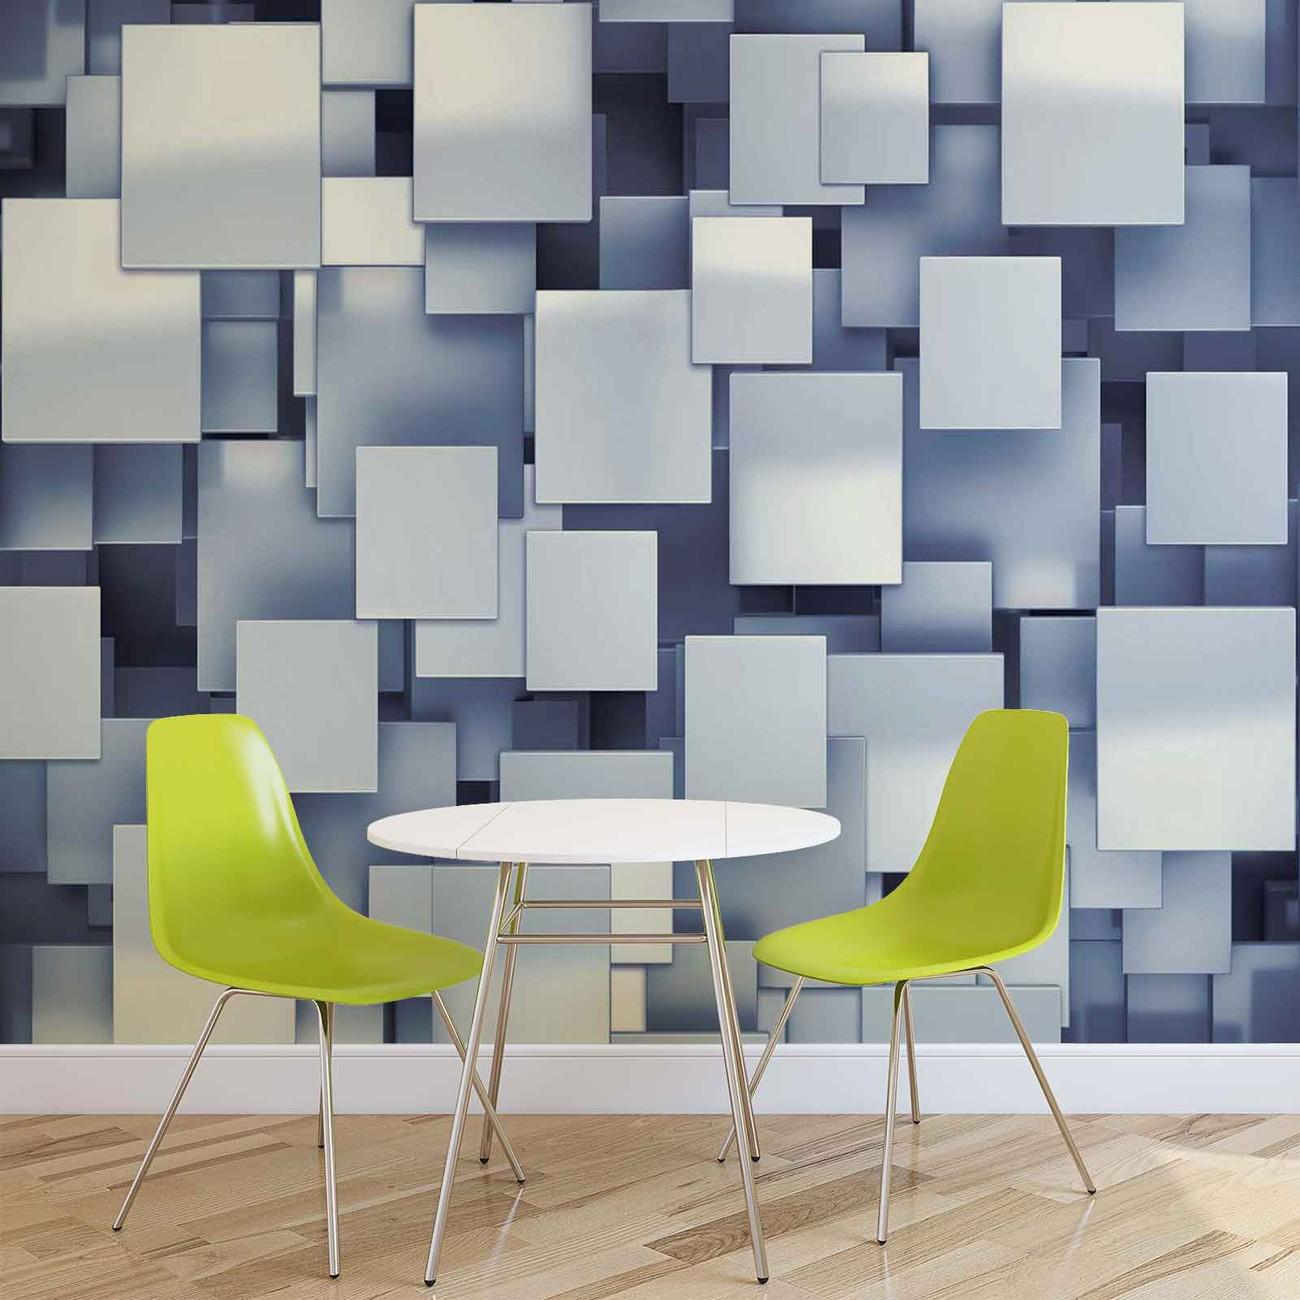 Fototapete tapete abstract squares moderne blau bei europosters kostenloser versand - Moderne fototapeten ...